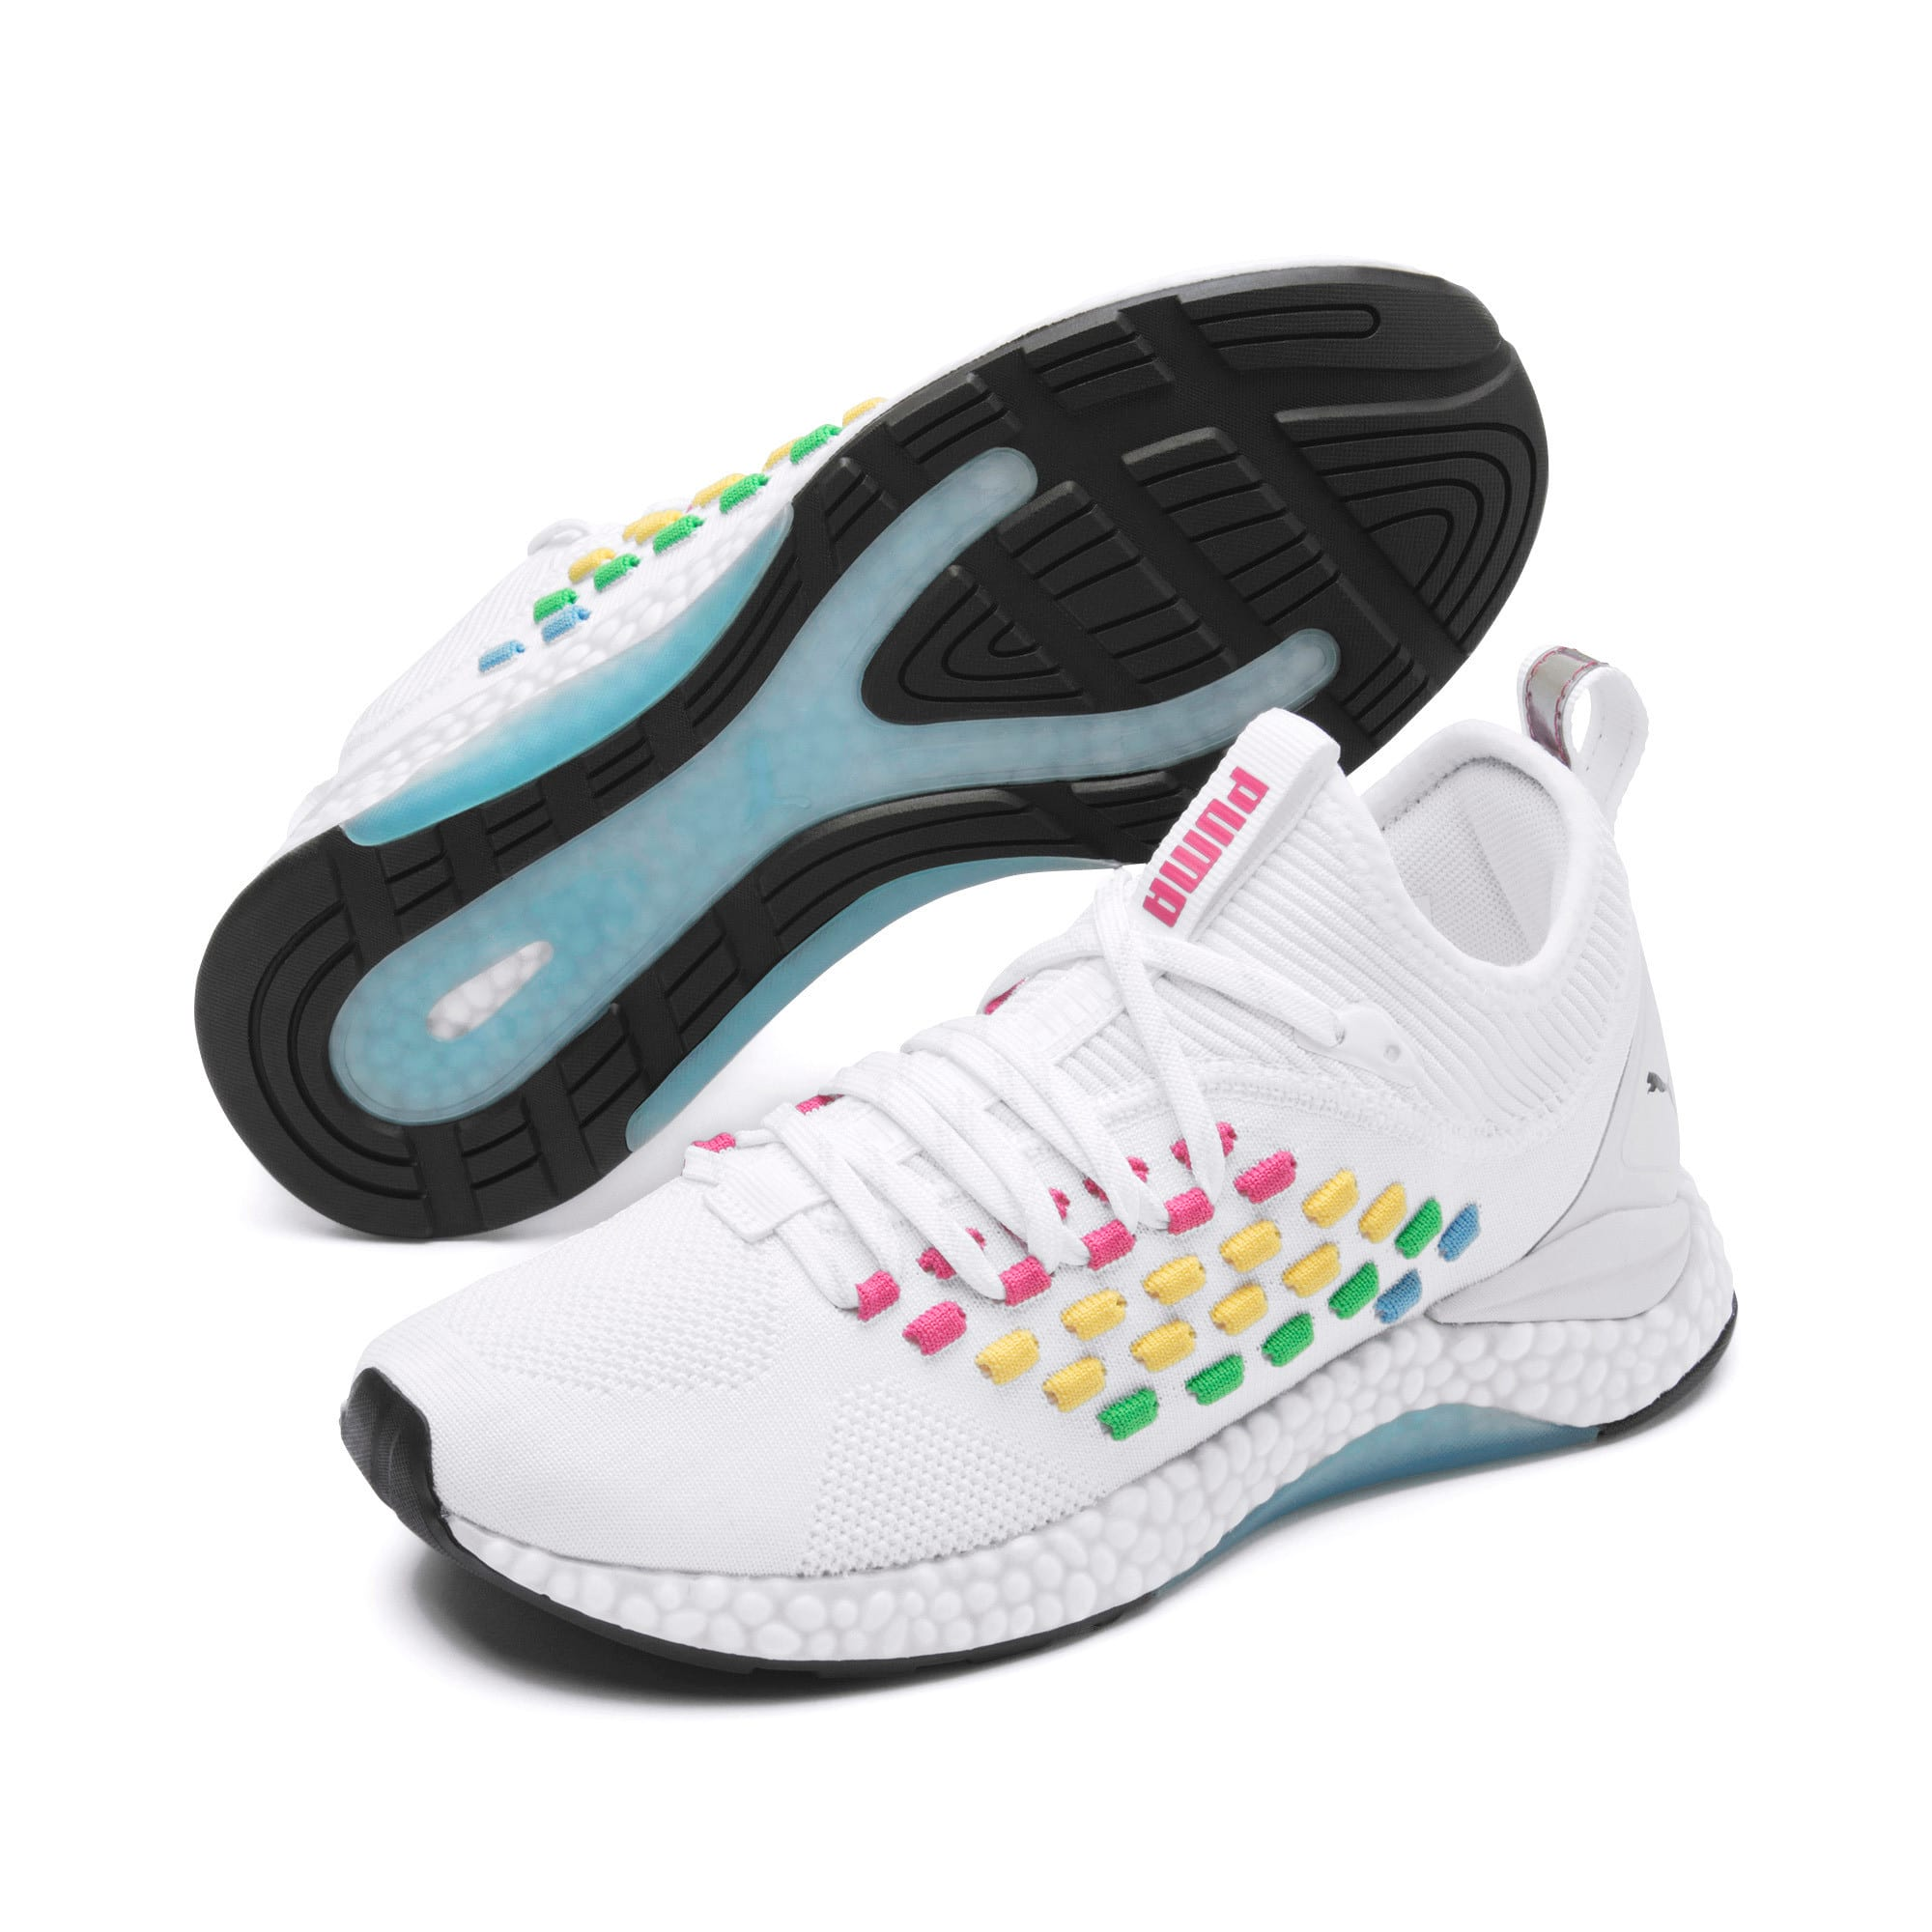 Thumbnail 2 of FUSEFIT HEATMAP Women's Running Shoes, Puma White-Glacier Gray, medium